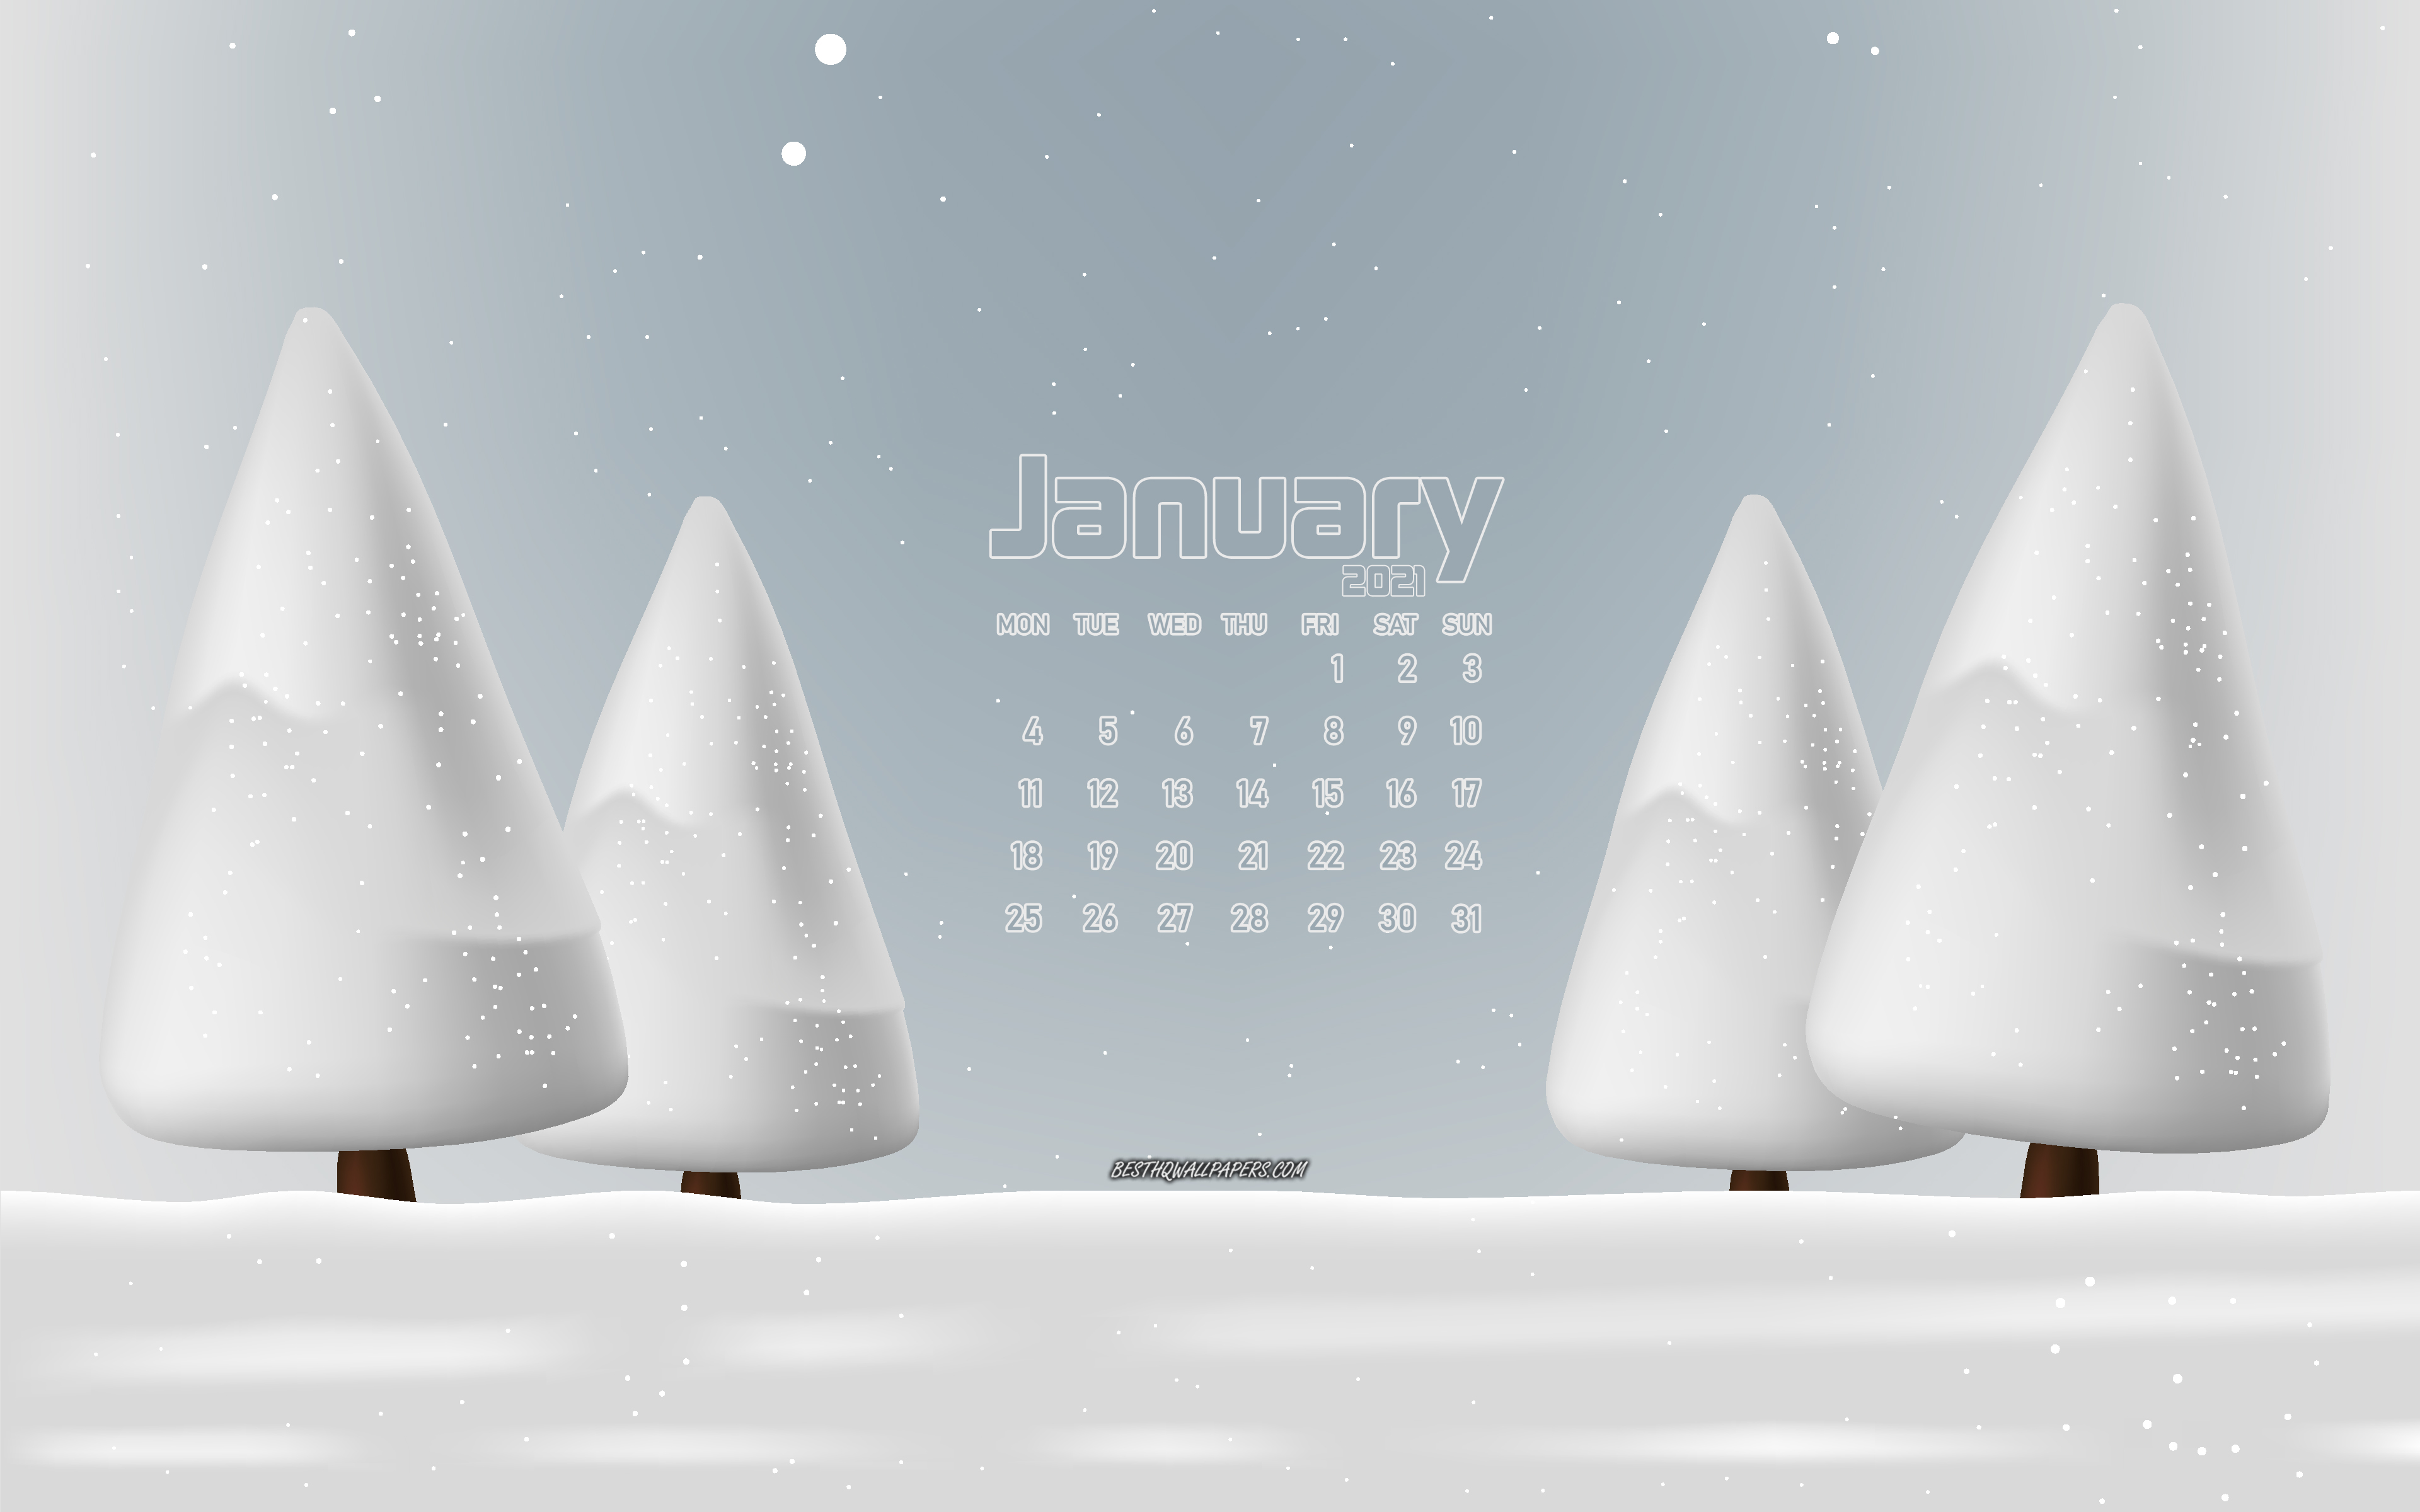 Download wallpapers 2021 January calendar 4k winter landscape 3840x2400